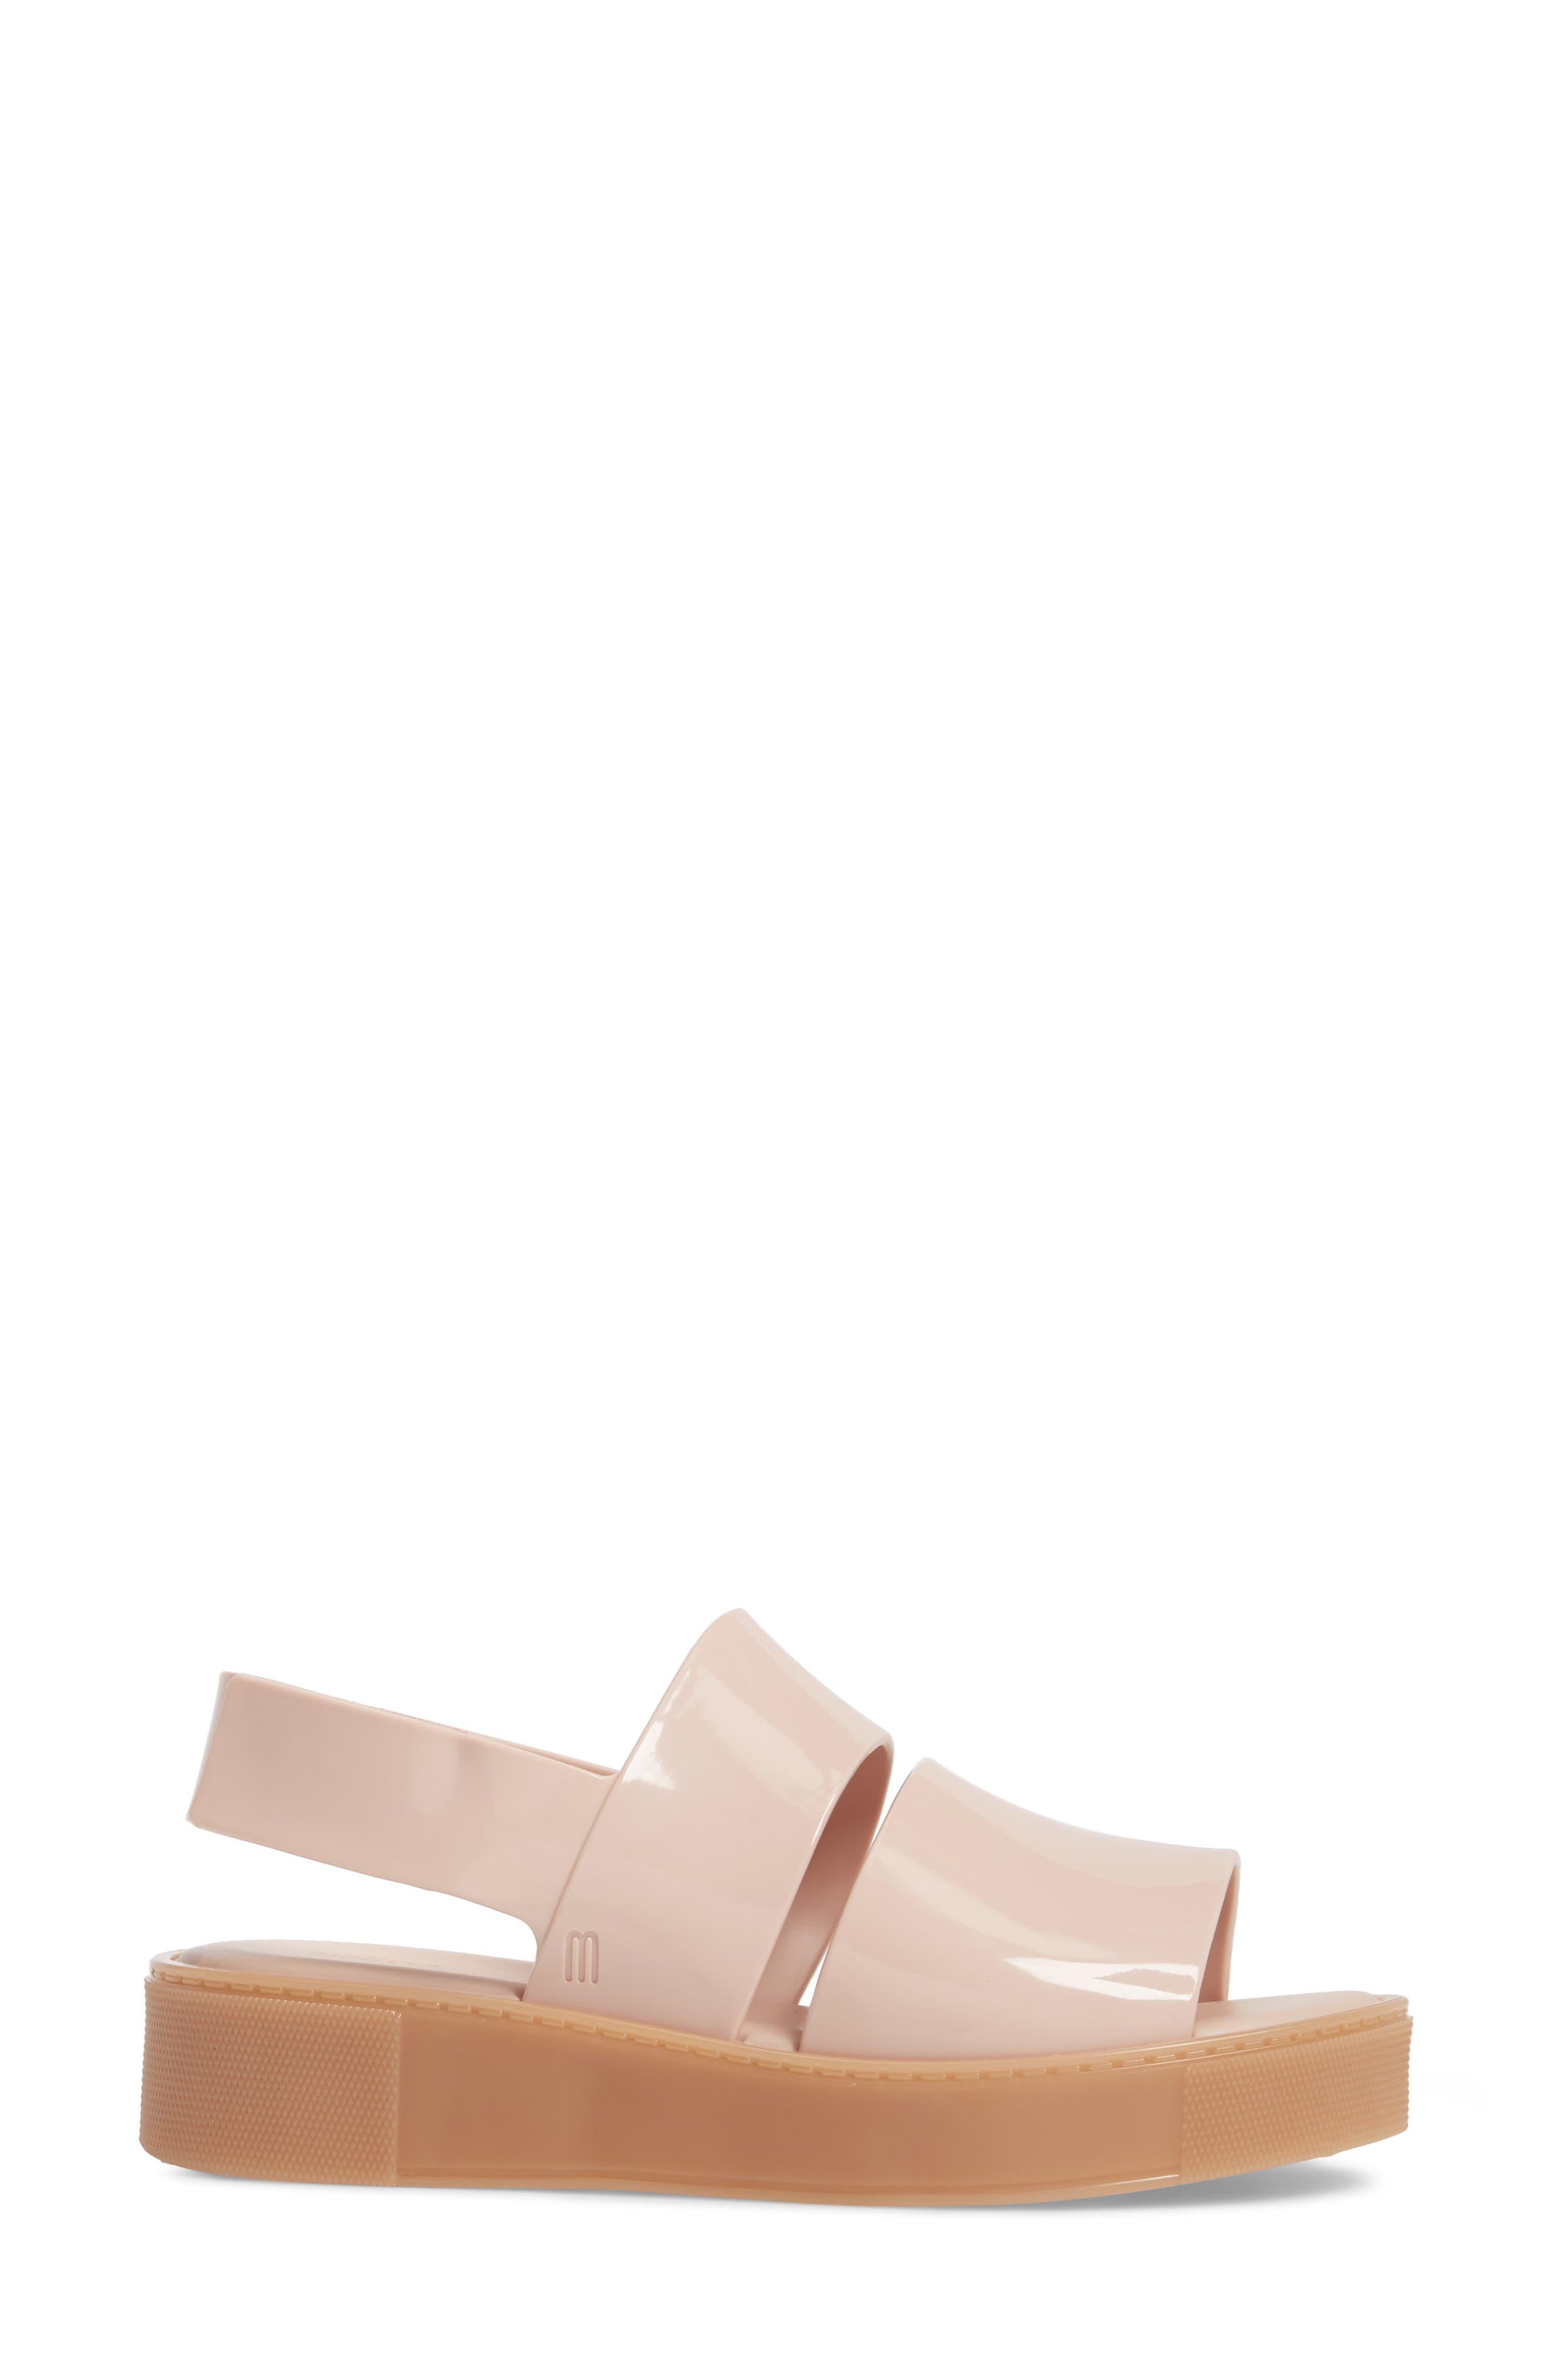 Soho Platform Sandal,                             Alternate thumbnail 6, color,